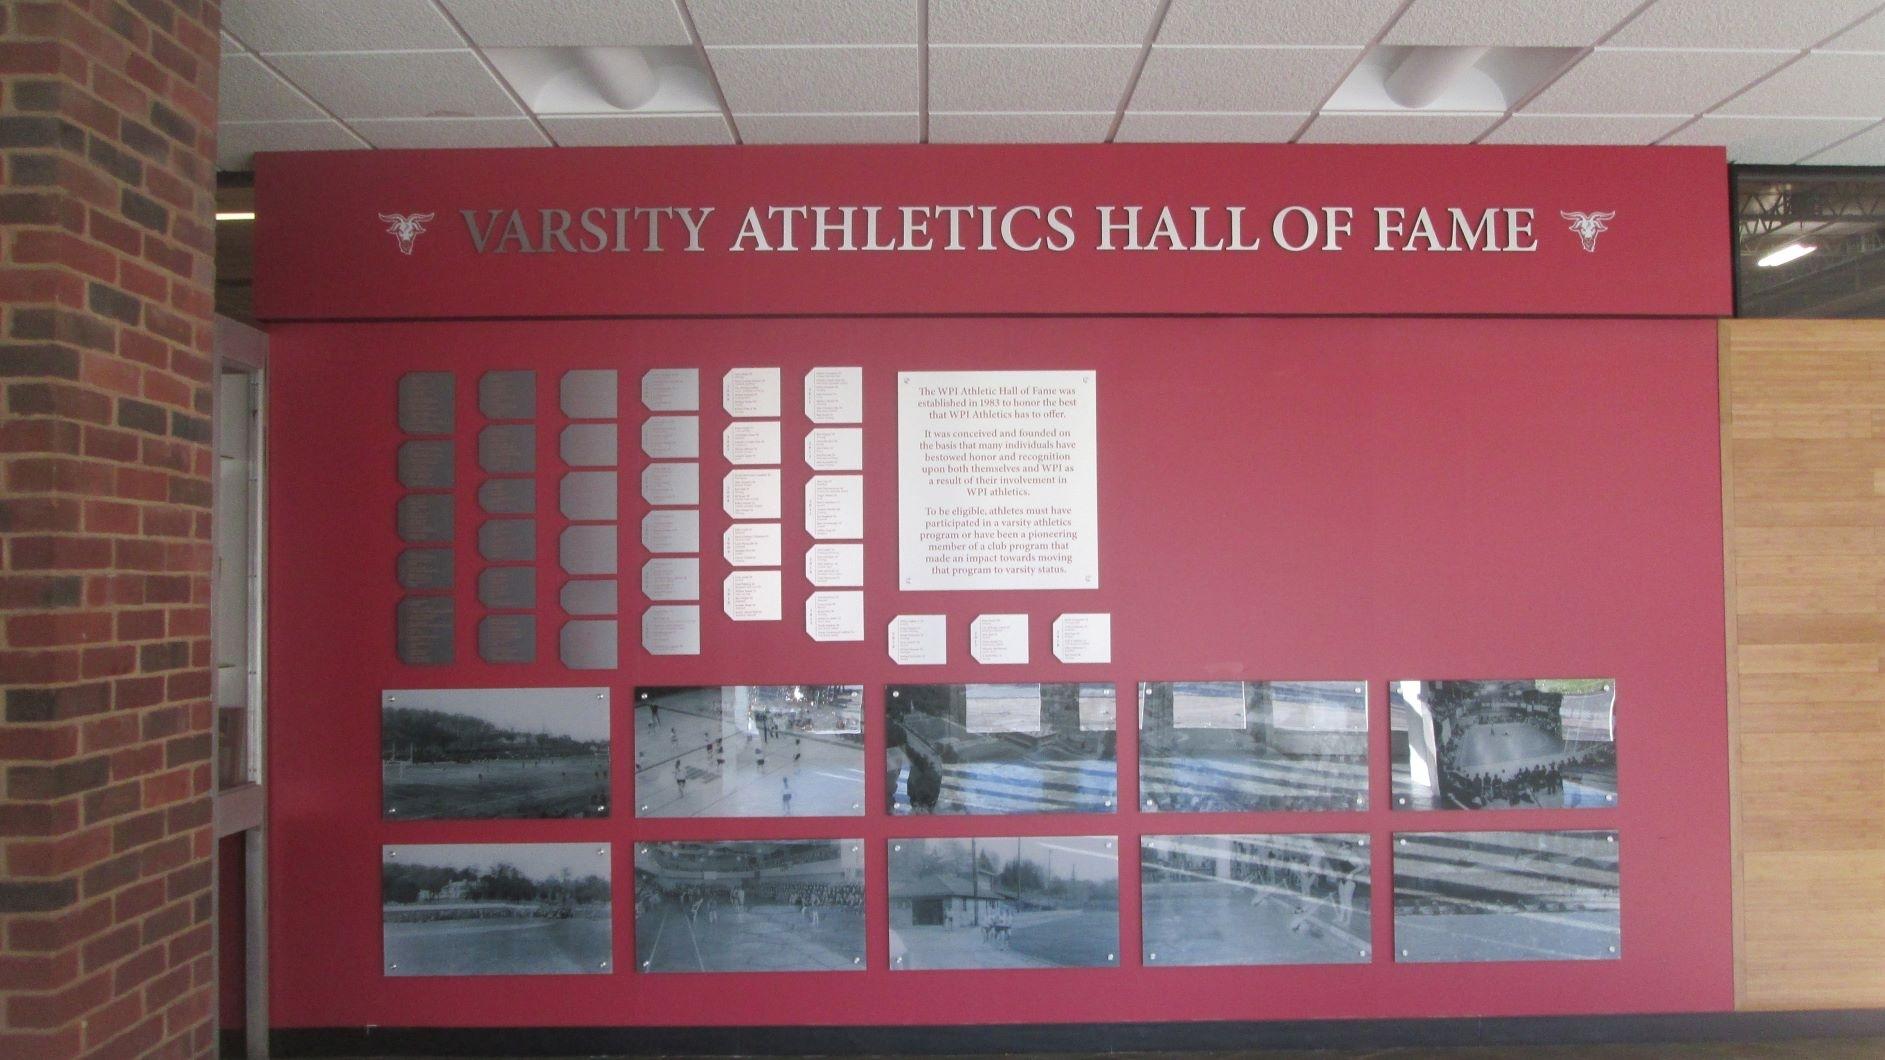 Harrington Auditorium – Wpi Engineers | Stadium Journey